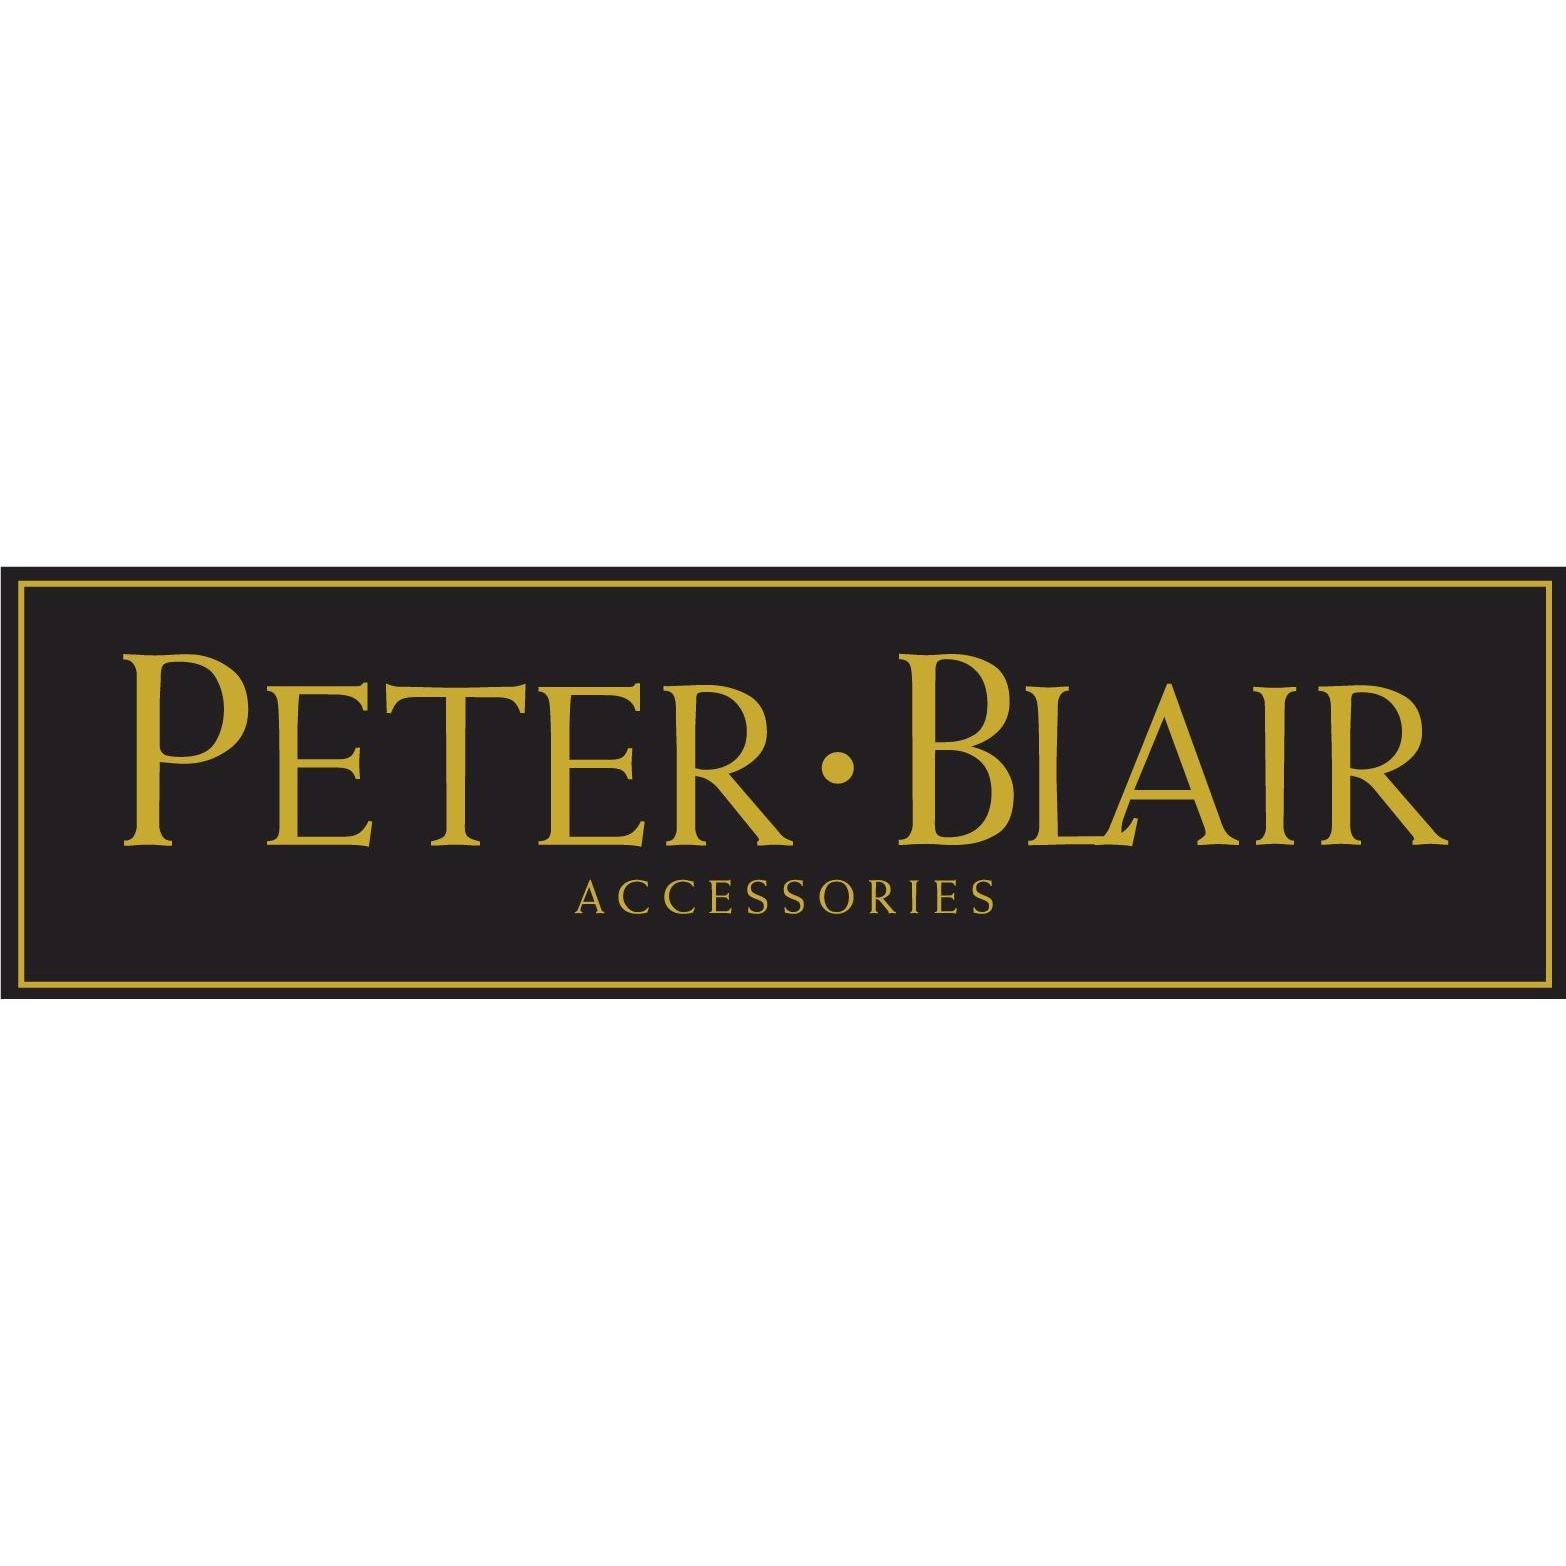 Peter Blair Accessories